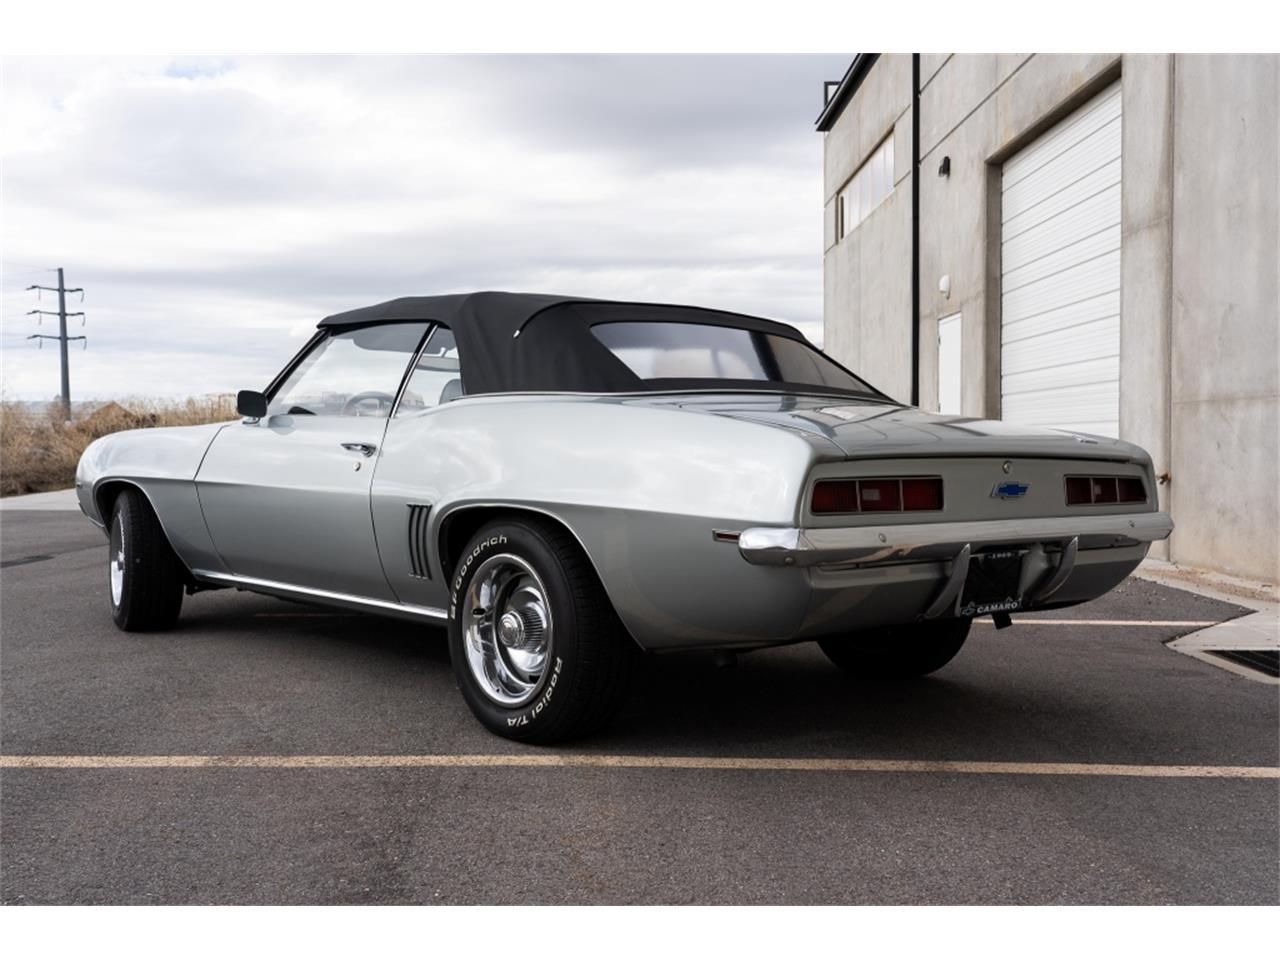 1969 Chevrolet Camaro (CC-1338217) for sale in Salt Lake City, Utah